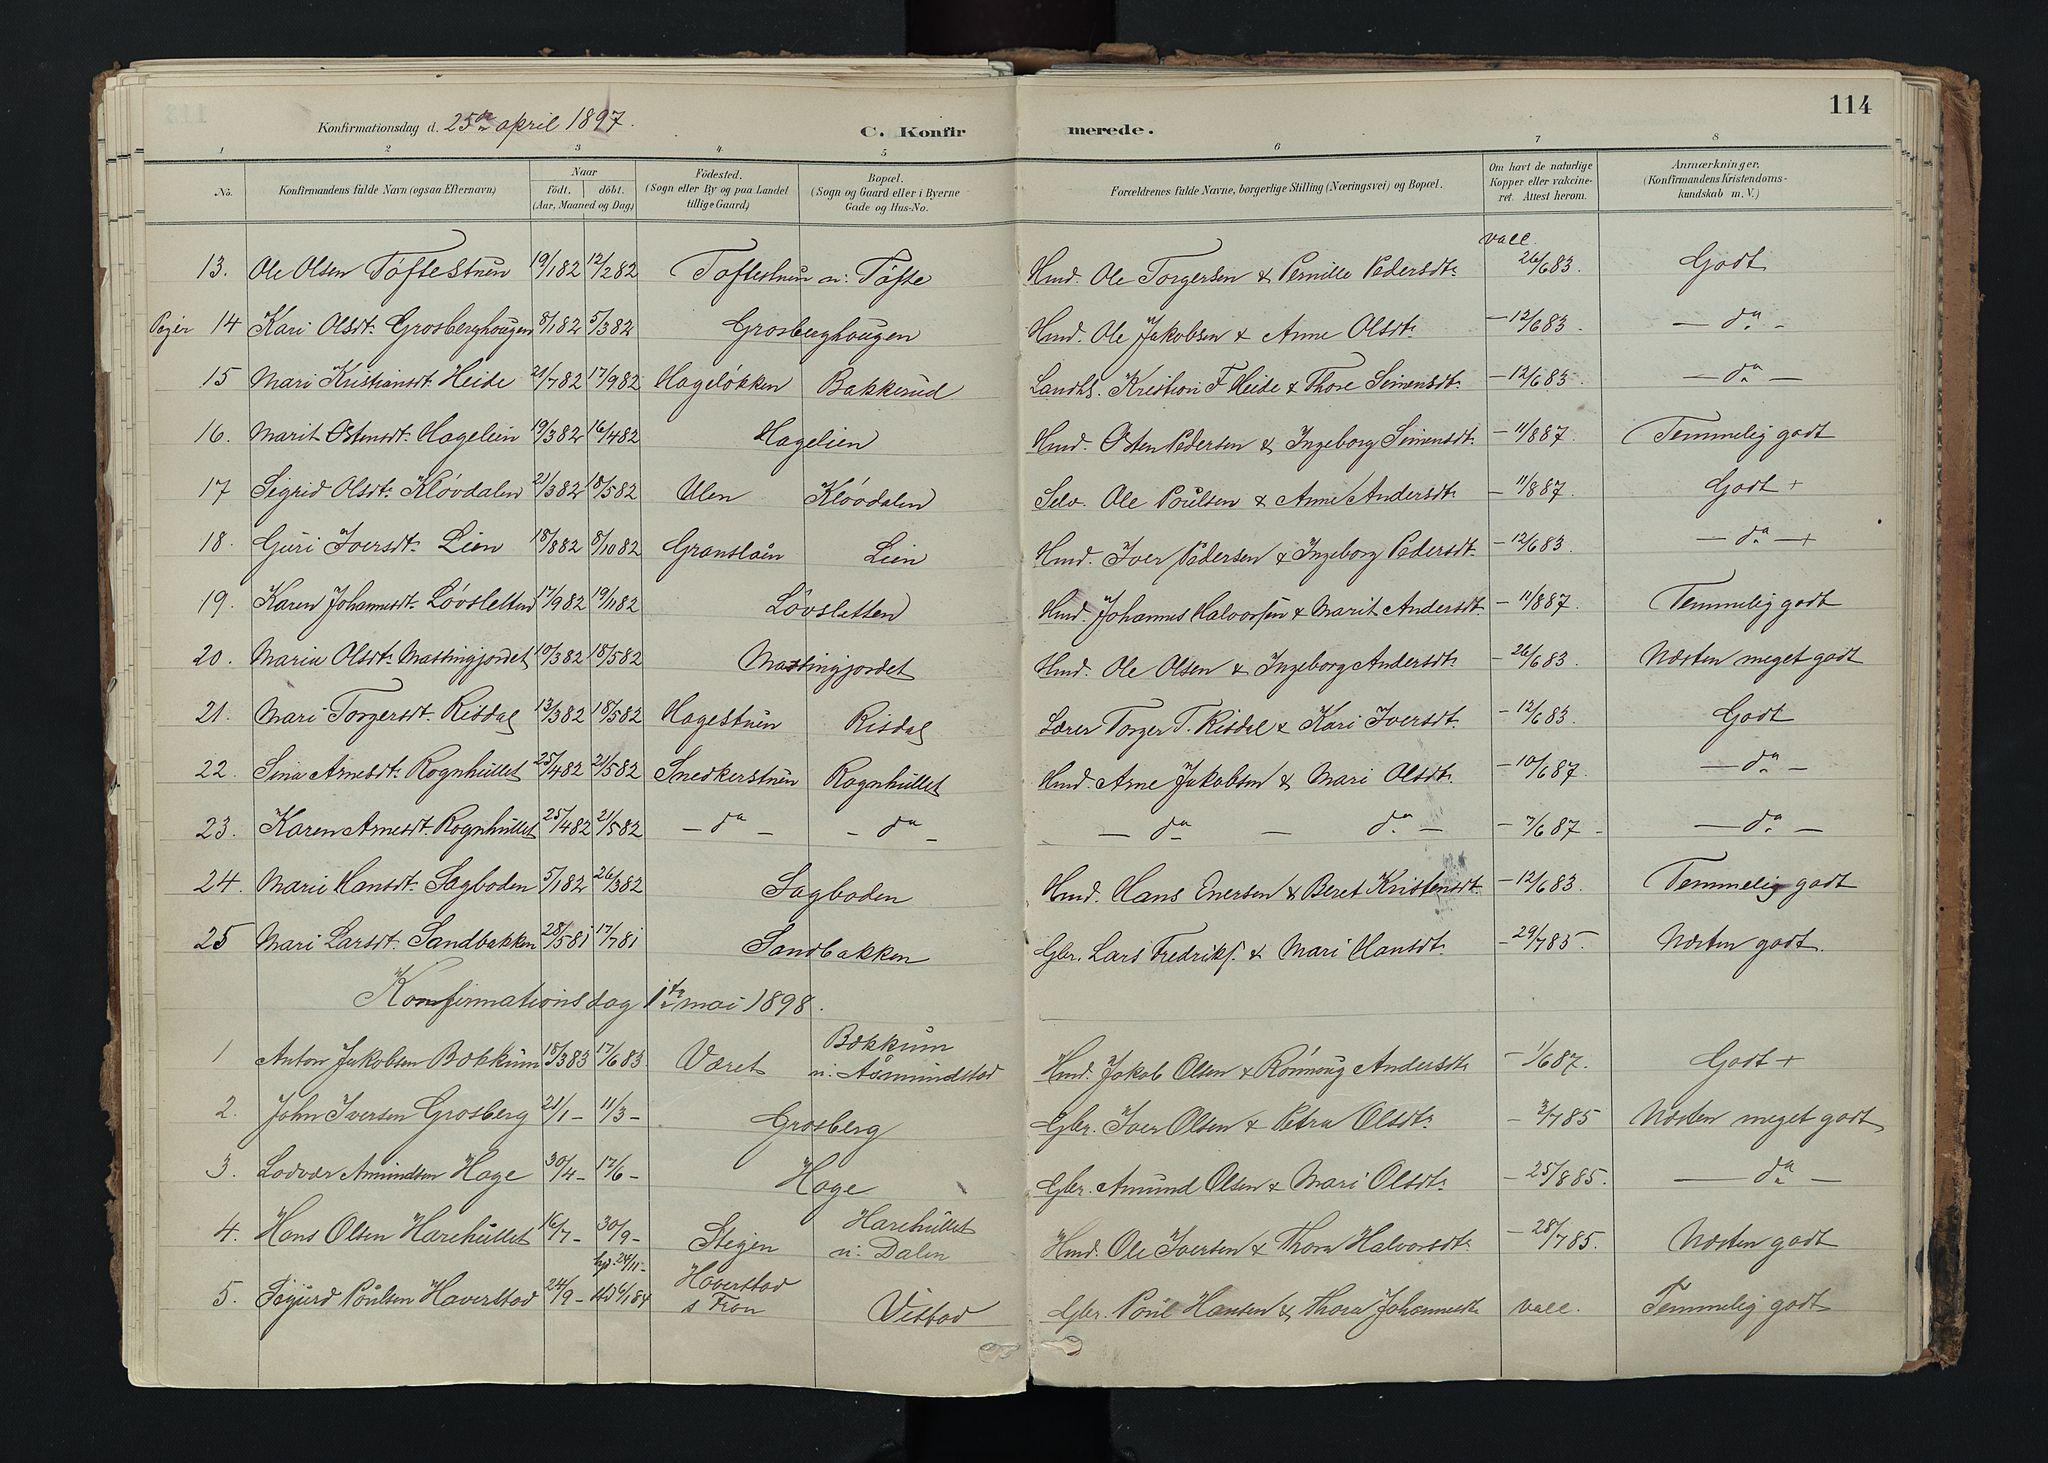 SAH, Nord-Fron prestekontor, Ministerialbok nr. 5, 1884-1914, s. 114